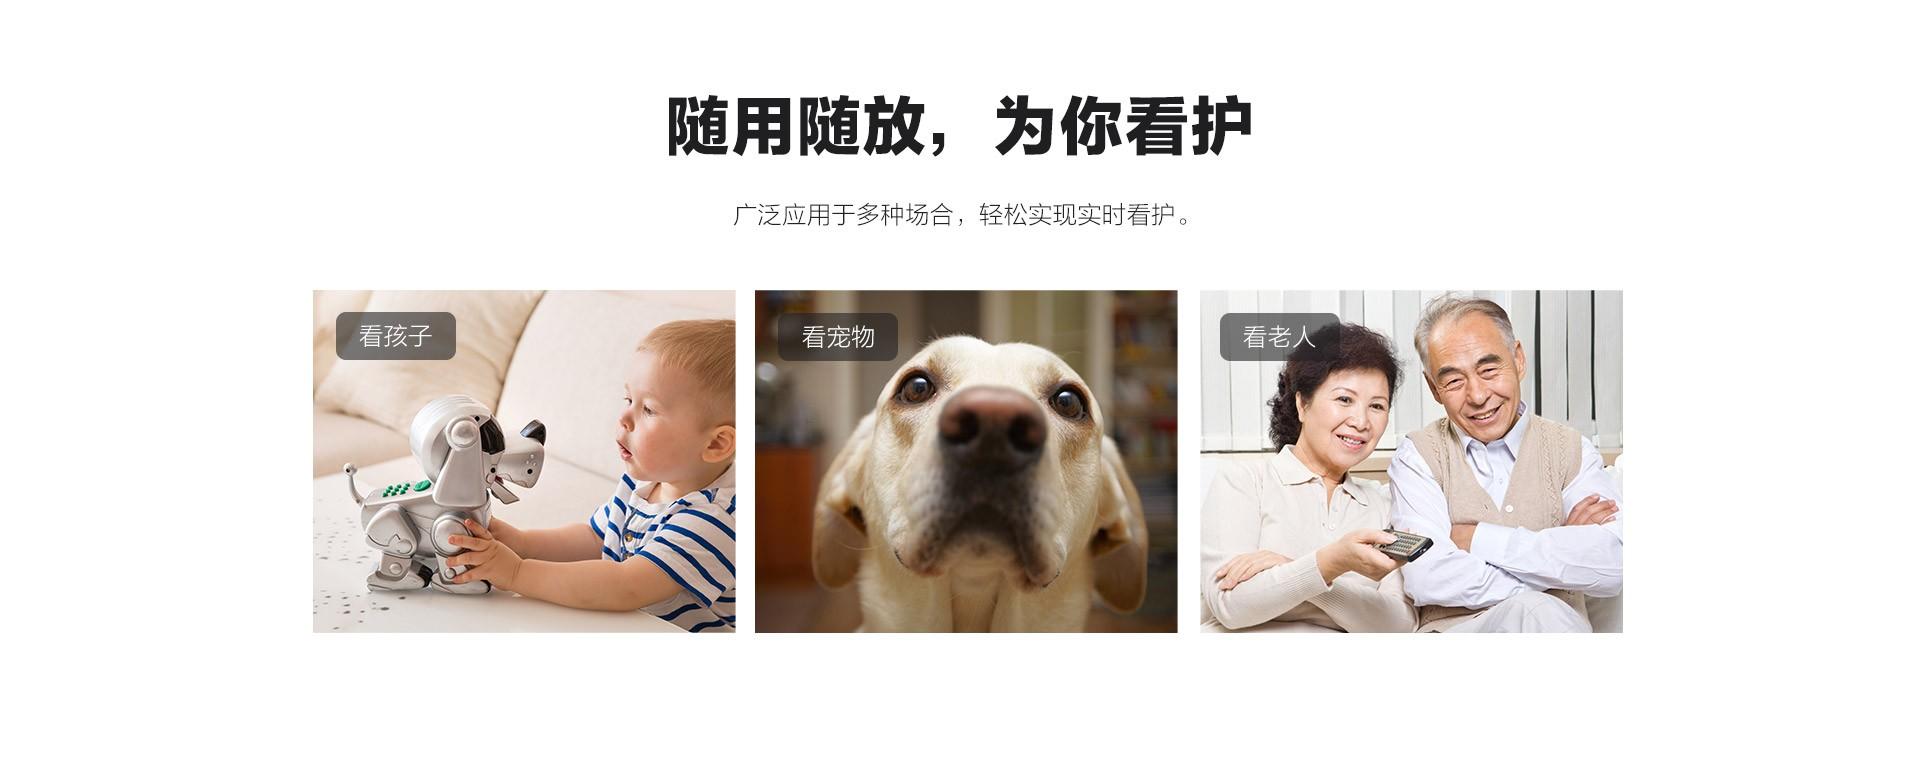 C3A-web_04.jpg